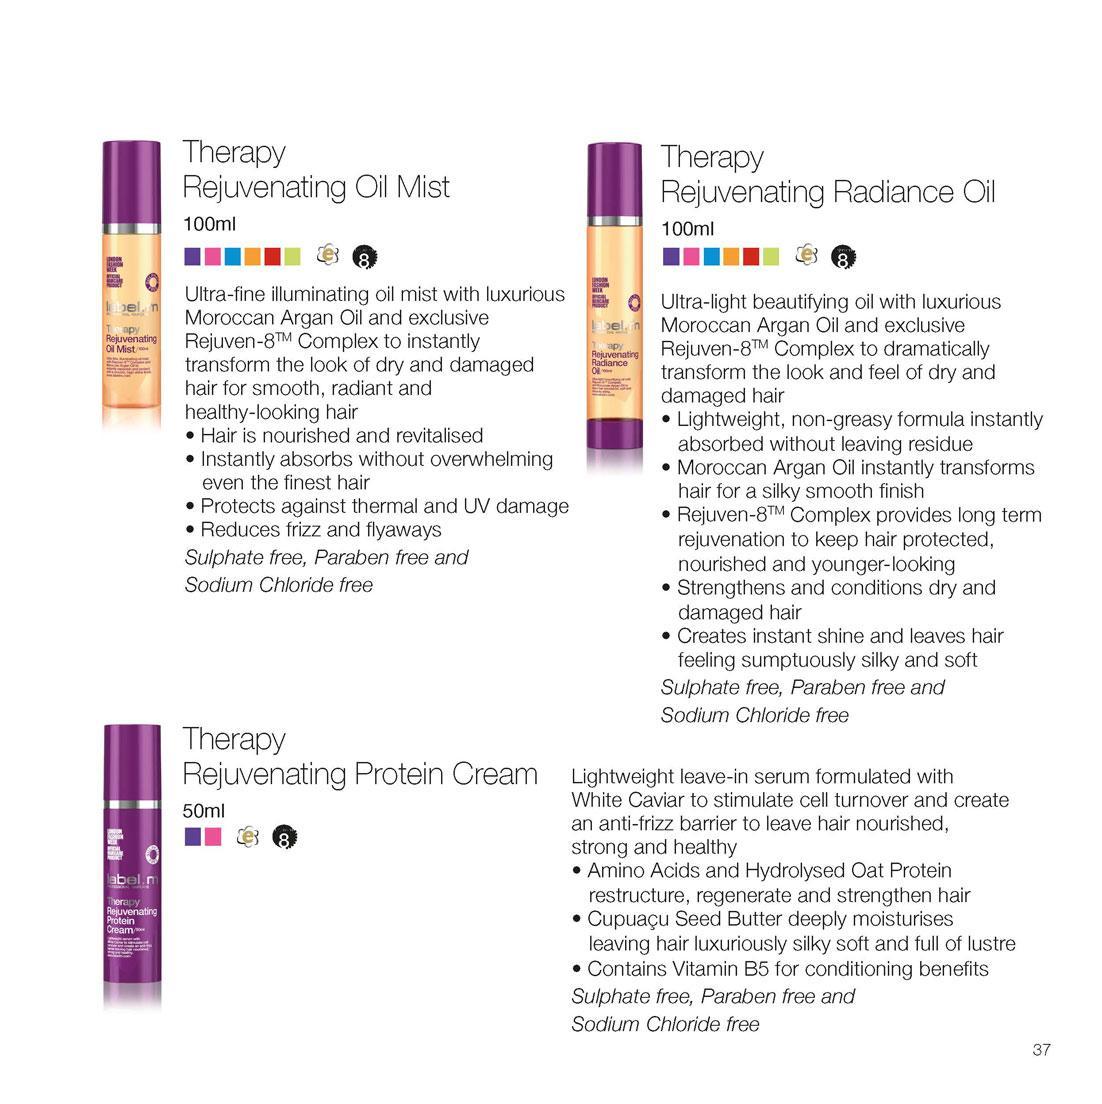 587.9-label-m-therapy-rejuvenating-4-pg-37.jpg